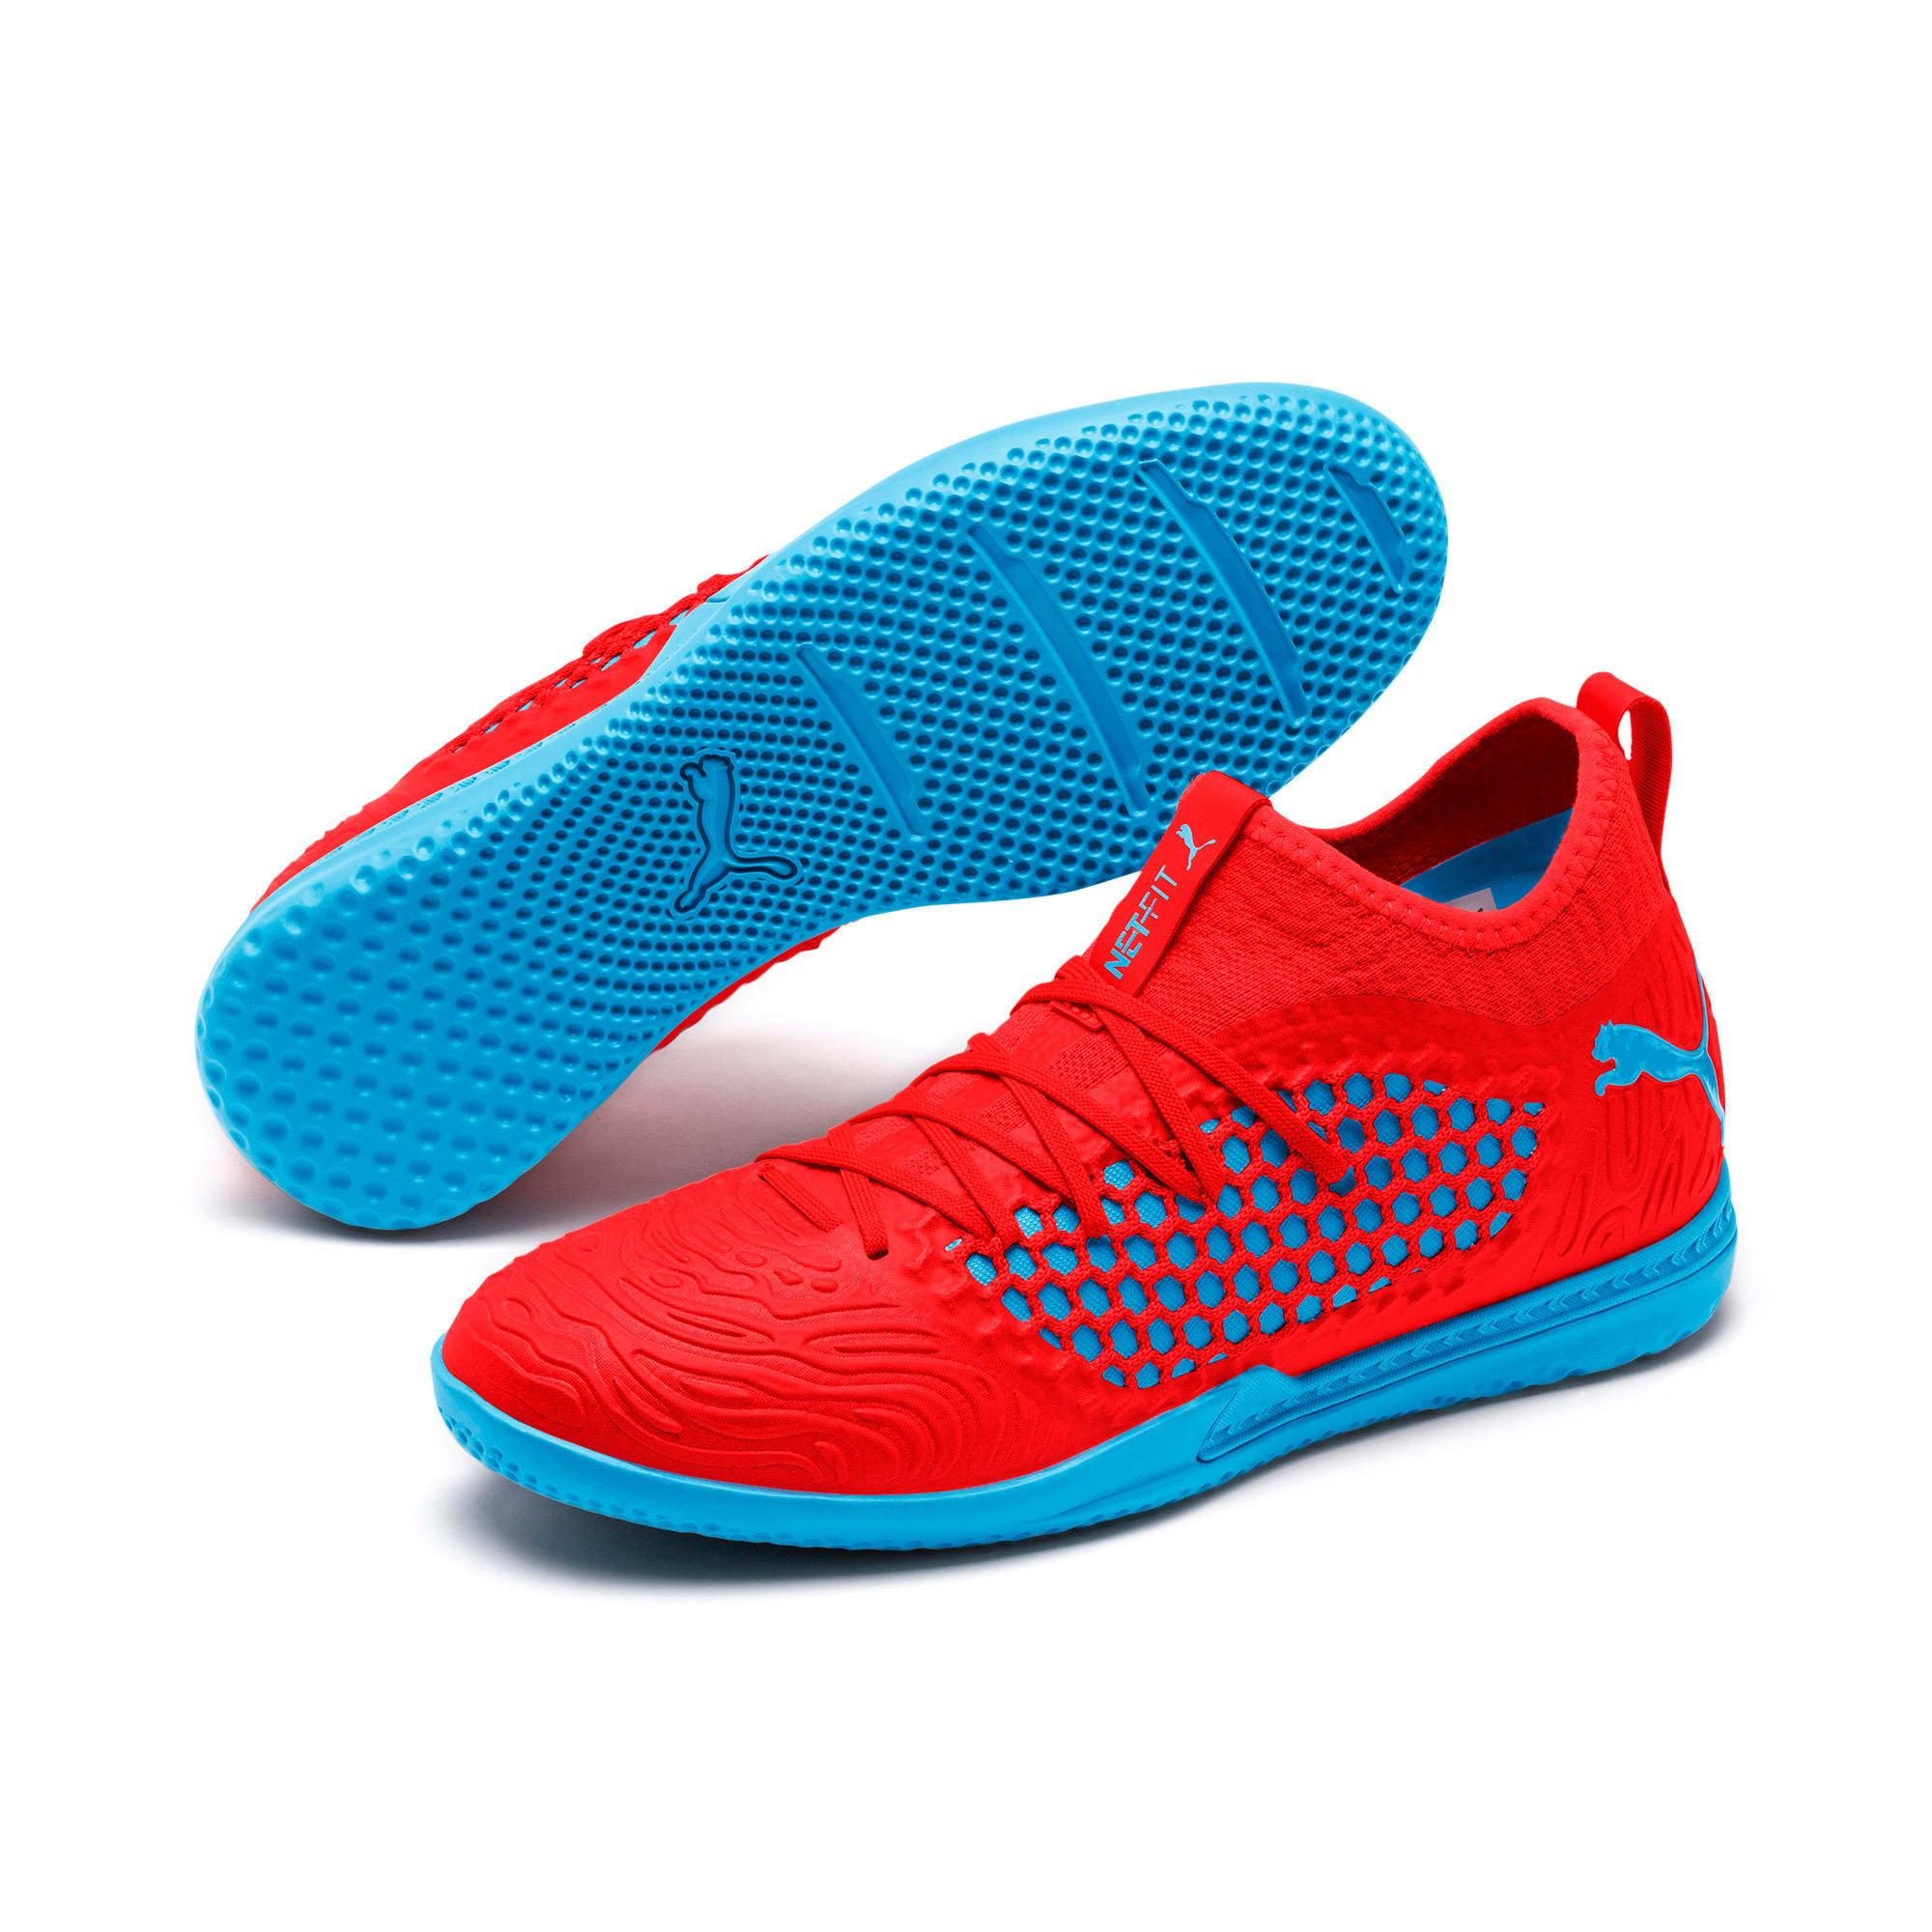 Thumbnail 2 of FUTURE 19.3 NETFIT IT Men's Soccer Shoes, Red Blast-Bleu Azur, medium